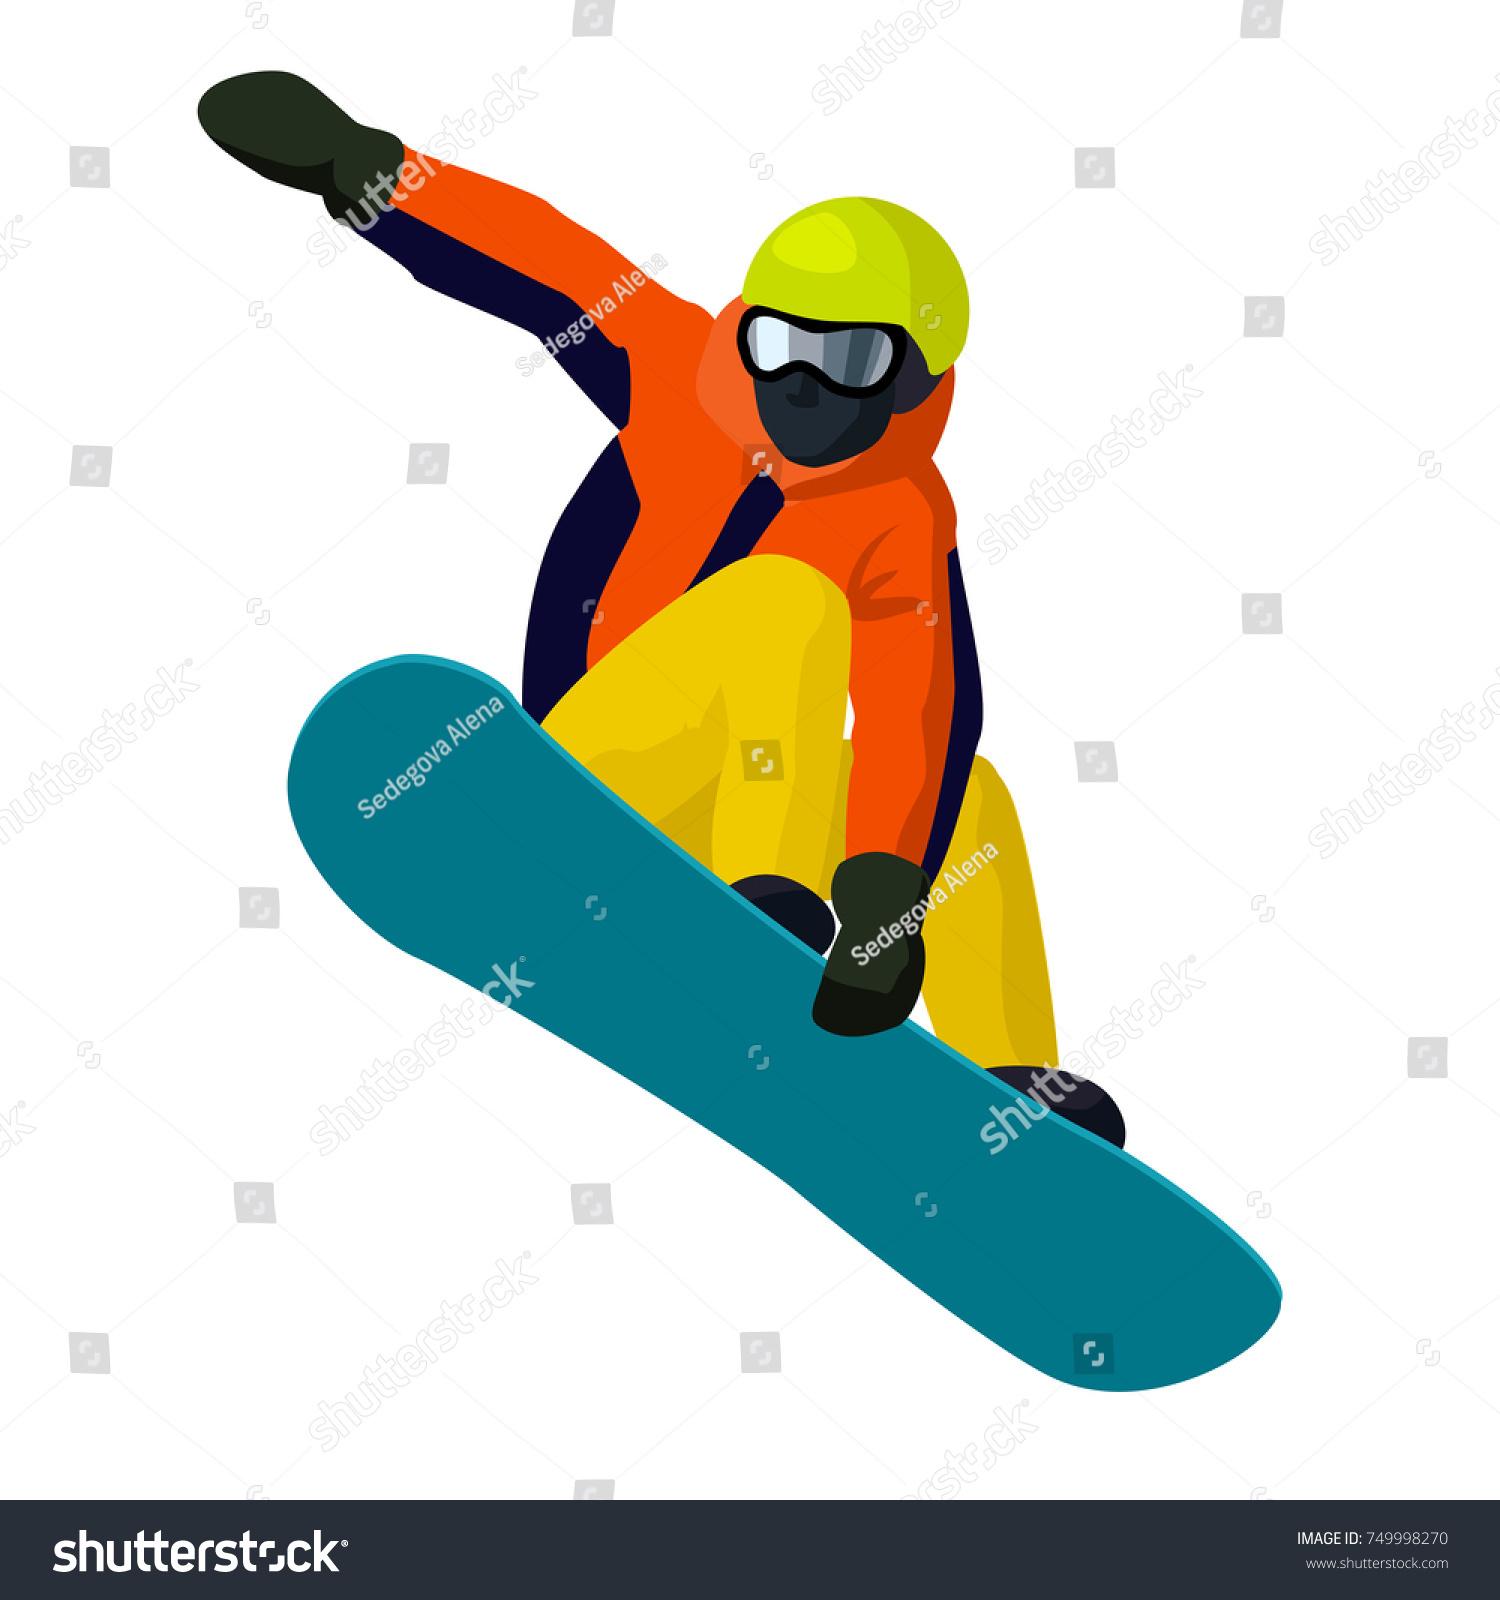 Vector Flat Cartoon Snowboarder Jumping Cartoon Stock Vector Royalty Free 749998270